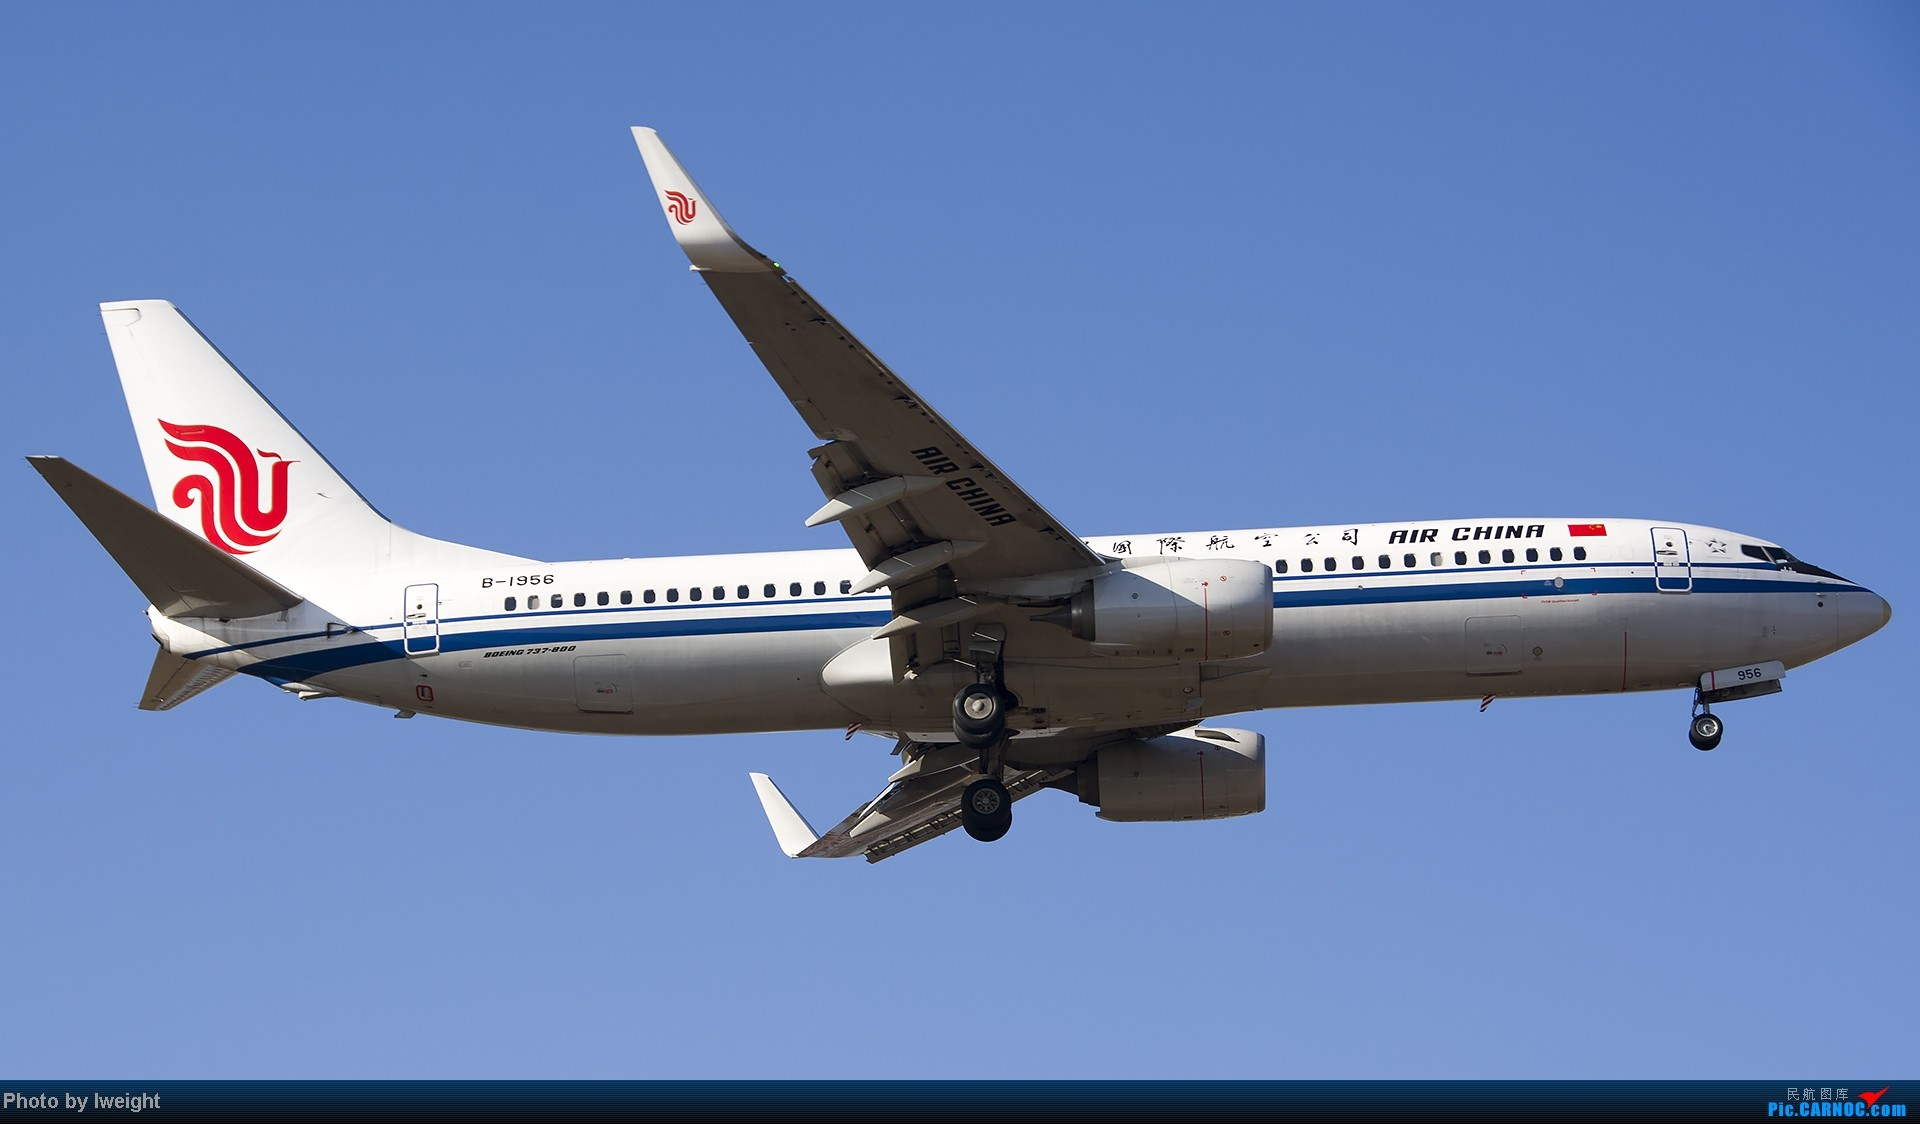 Re:[原创]抓住APEC蓝的尾巴,再拍上一组 BOEING 737-800 B-1956 中国北京首都机场